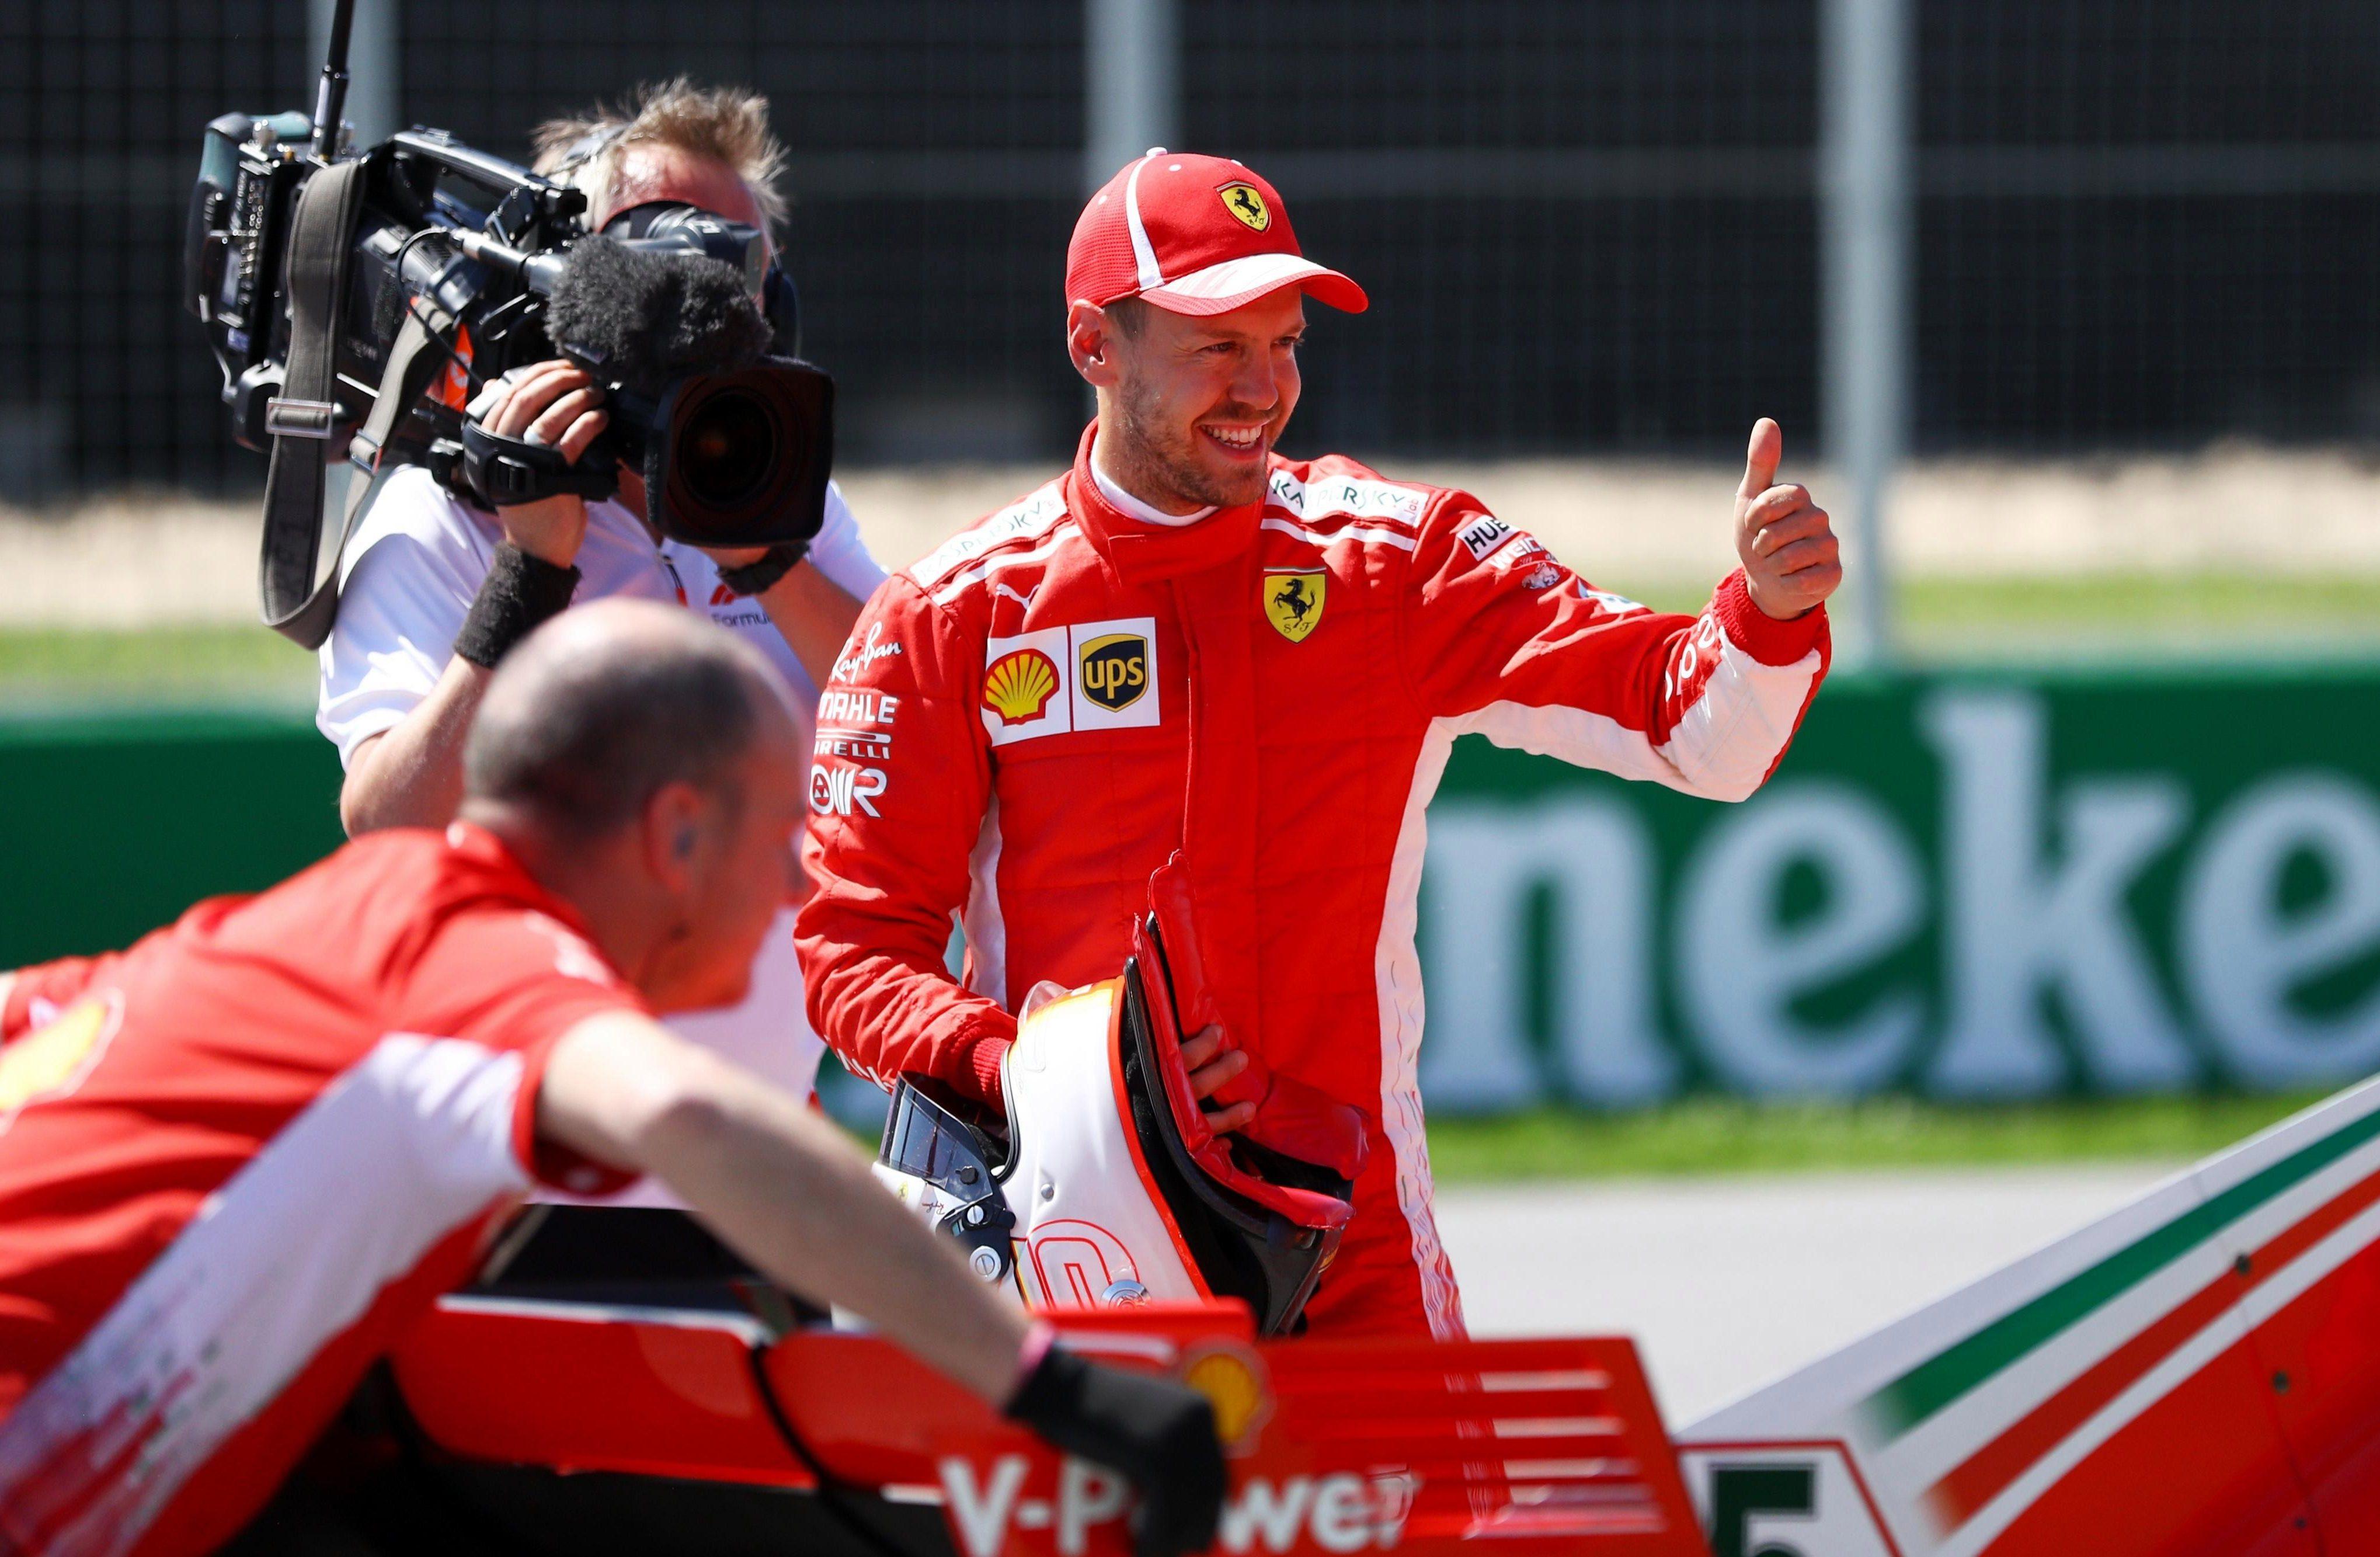 Sebastian Vettel took pole position in qualfiying